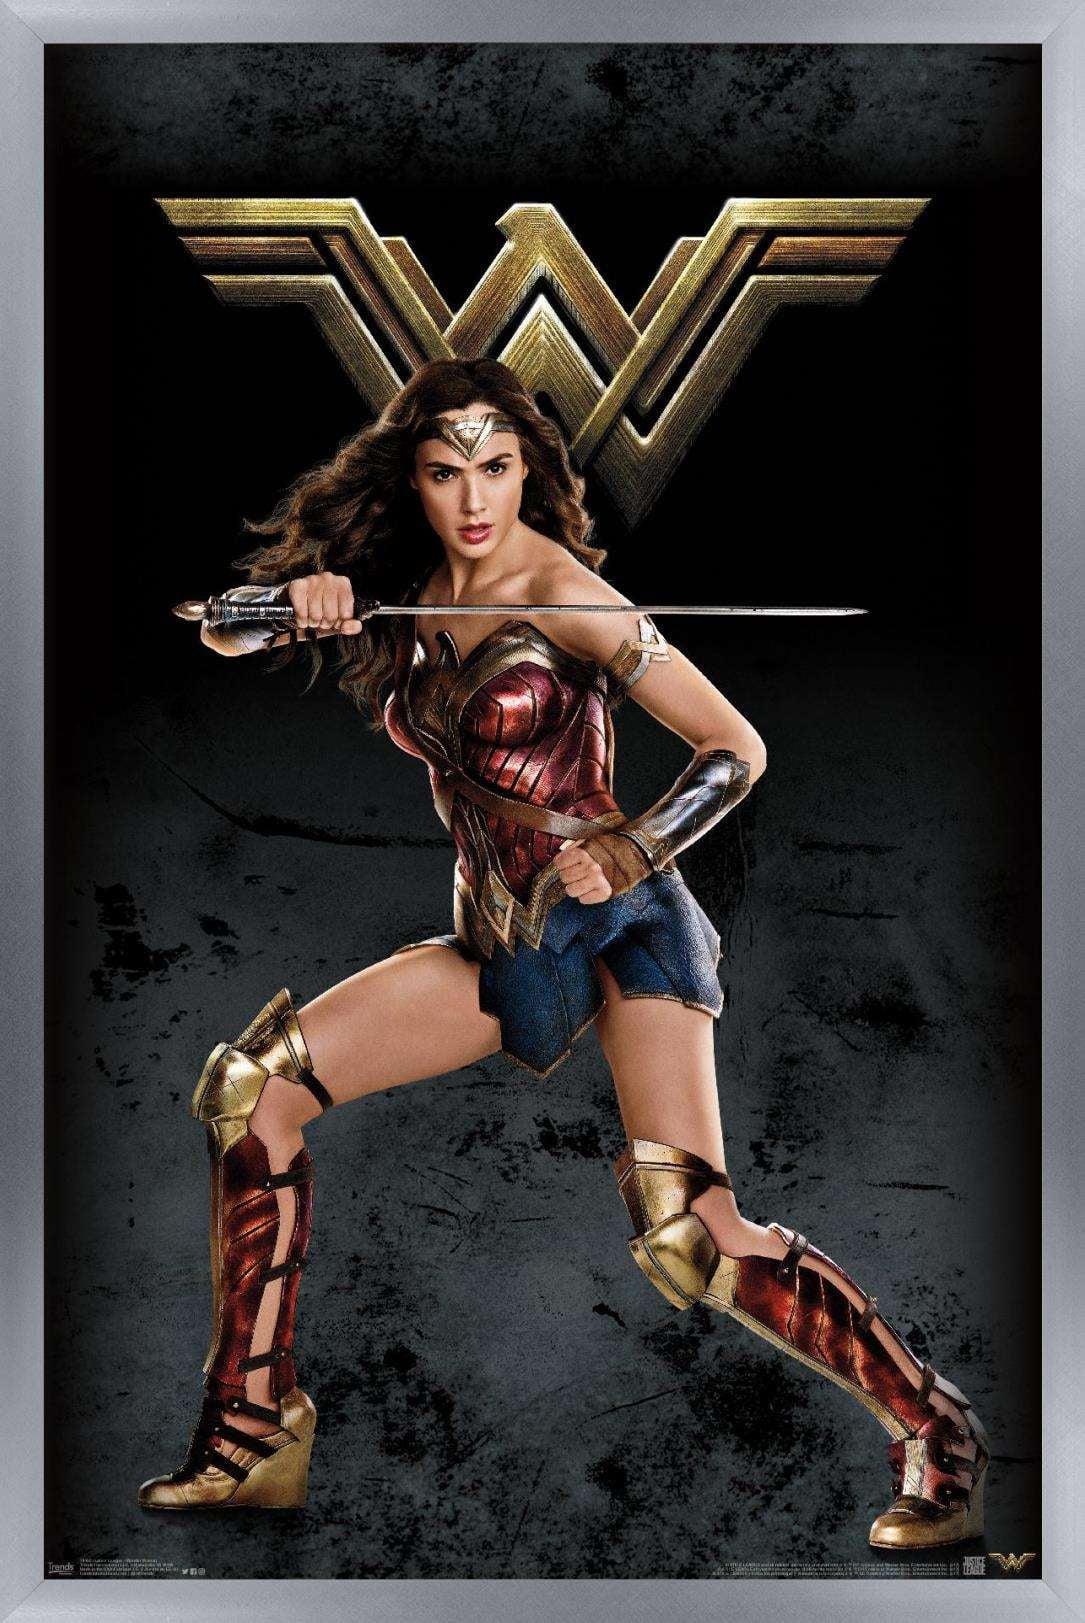 dc comics movie justice league wonder woman poster walmart com